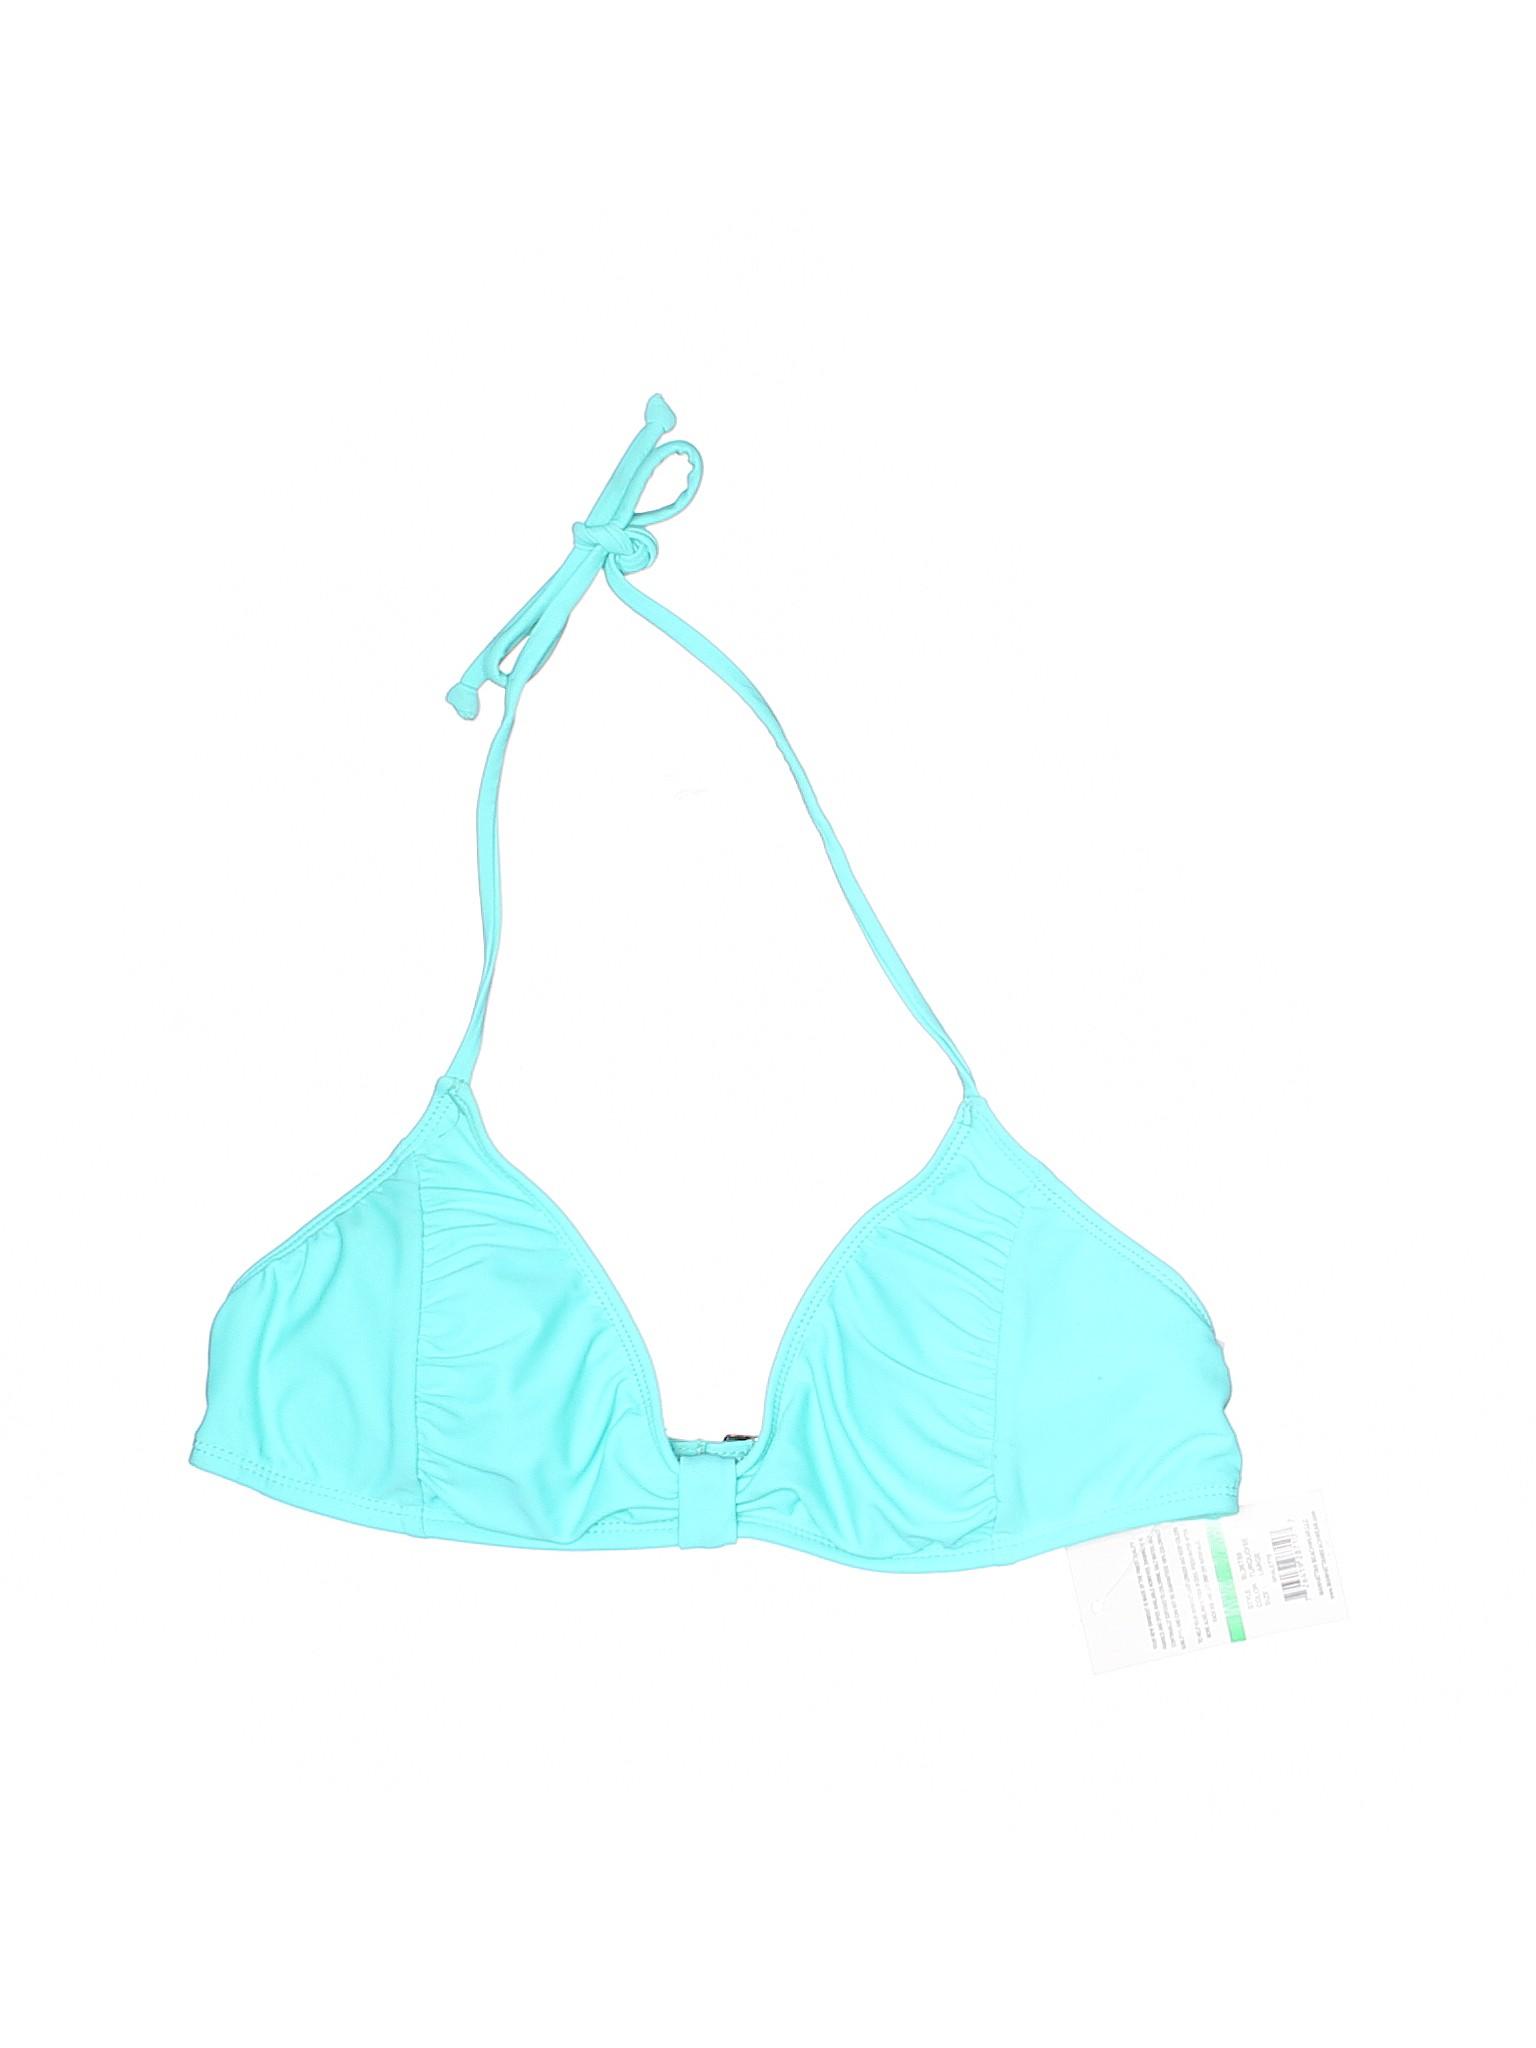 Boutique Top Lab Swimsuit Boutique Bikini Bikini YSxz8